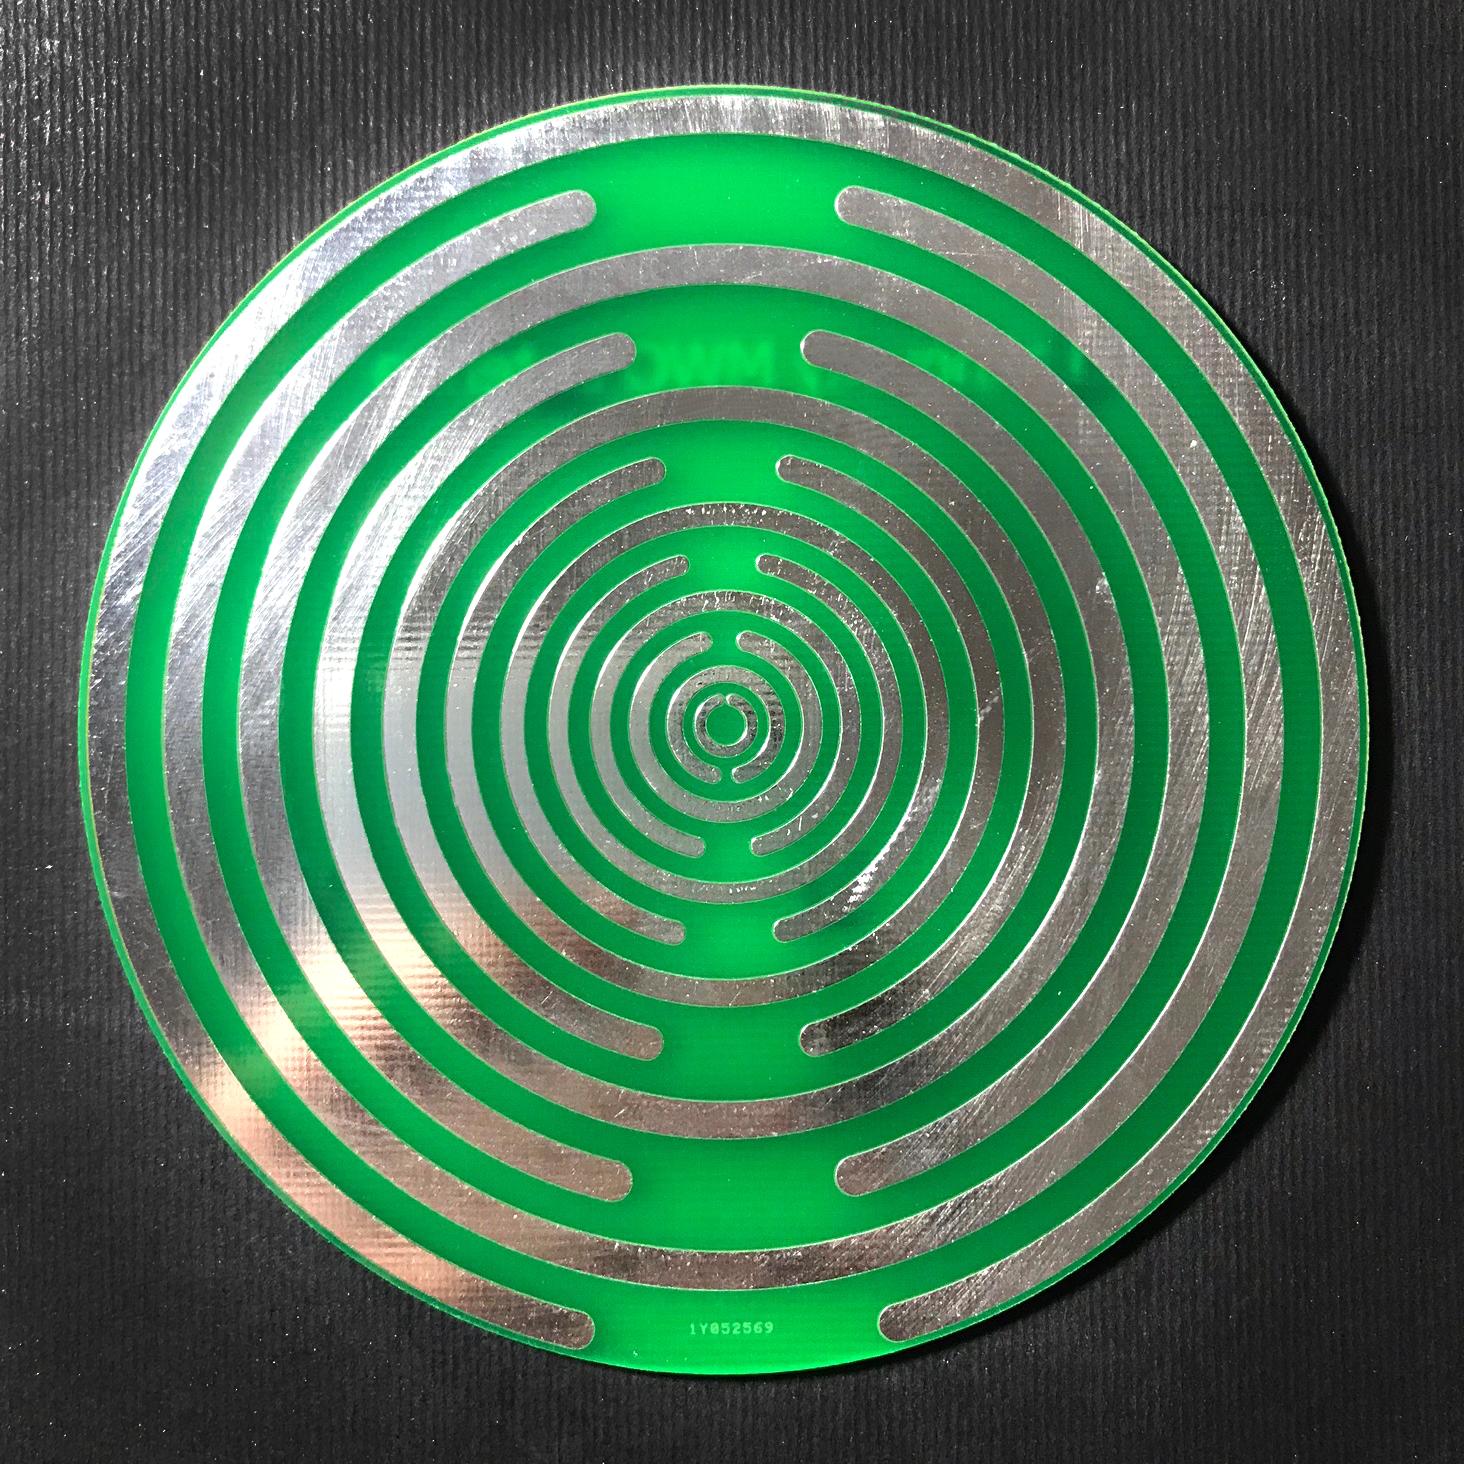 MWO Lakhovsky Golden Ratio antenna 10cm, tesla coil antenna 2